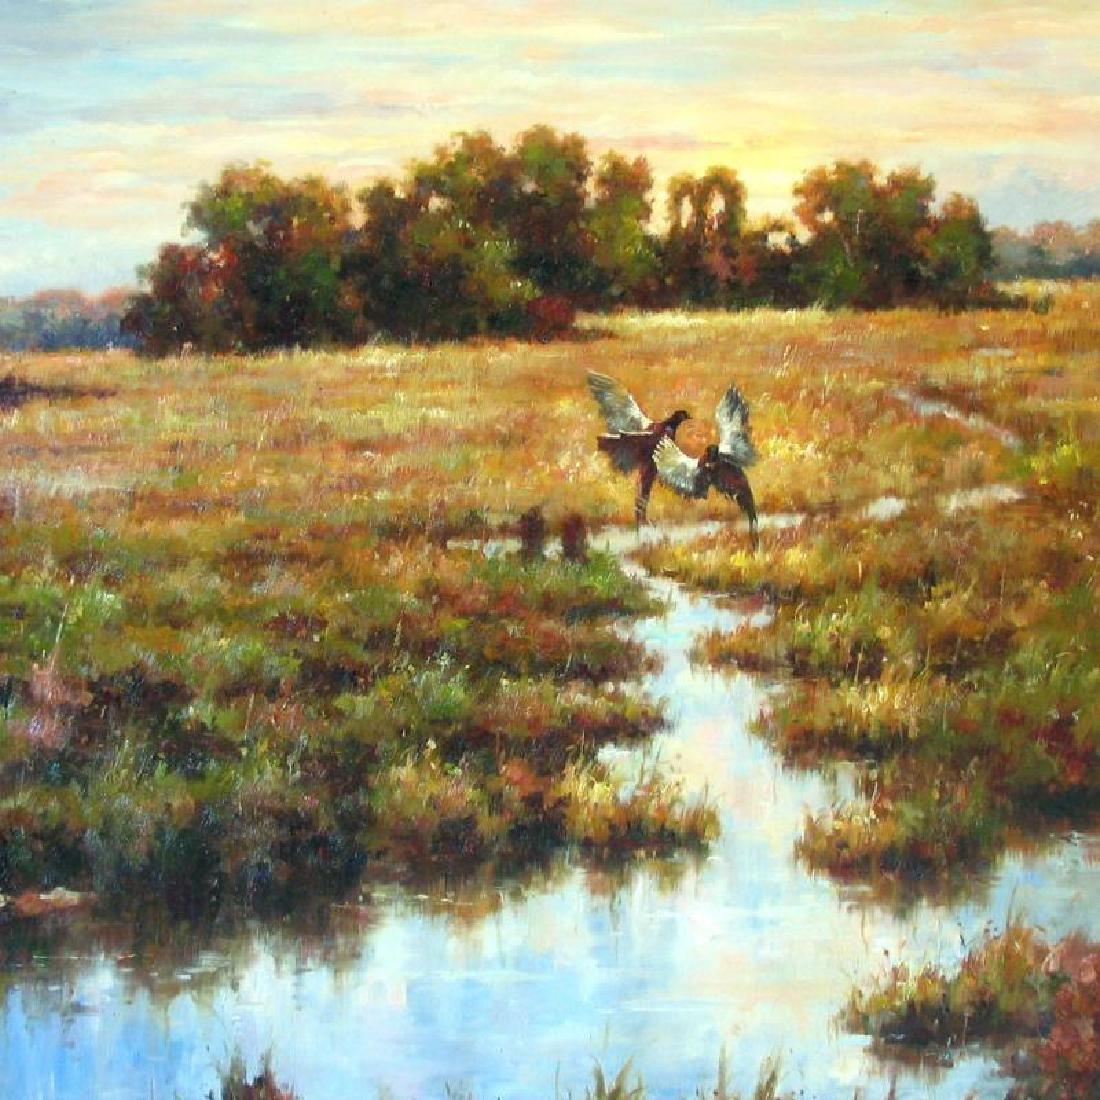 Everglades Wildlife Birds Landscape Low Country - 2